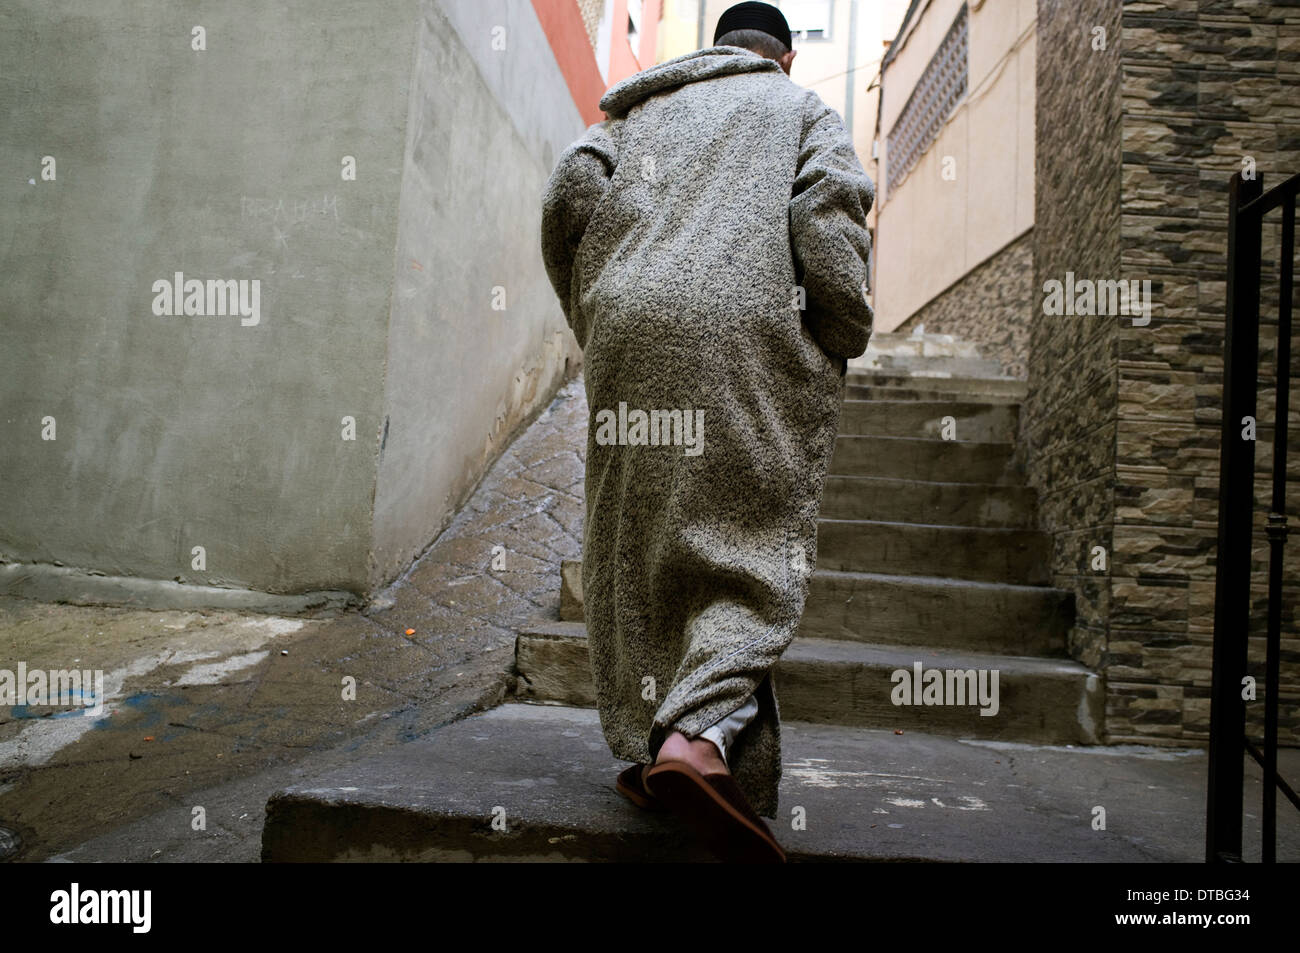 Islamic neighbourhood of Canada del Hidum in Melilla, Spain. poverty poor jobless suburb - Stock Image